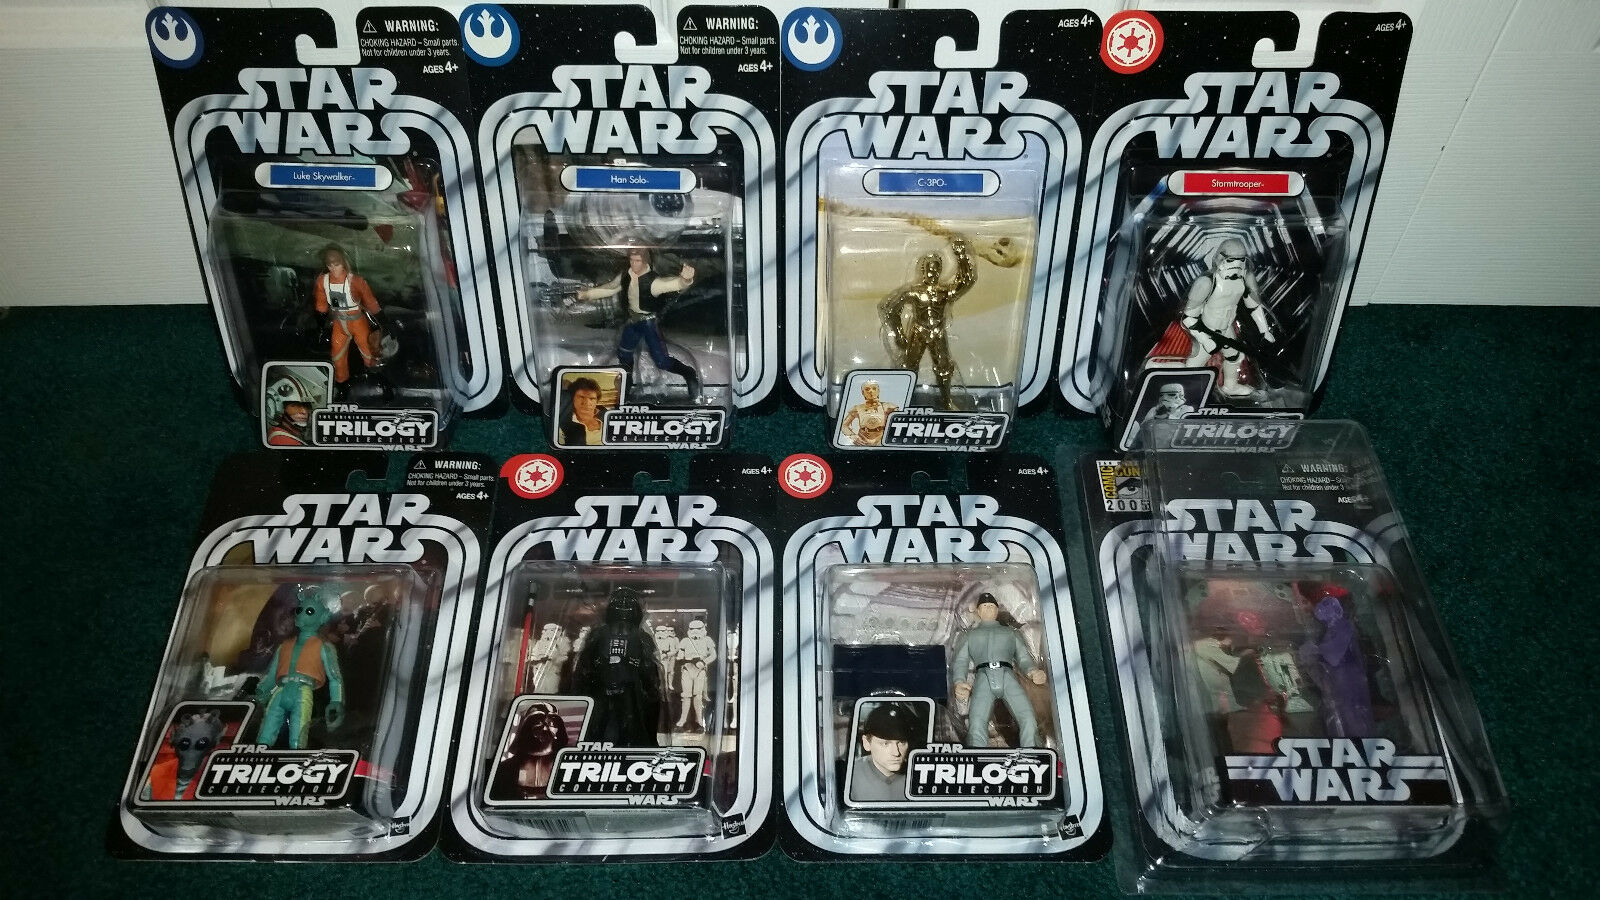 alta calidad Estrella Wars Otc A New Hope Hope Hope Luke Skywalker Han Solo C-3po Darth Vader Leia Sdcc +  Disfruta de un 50% de descuento.